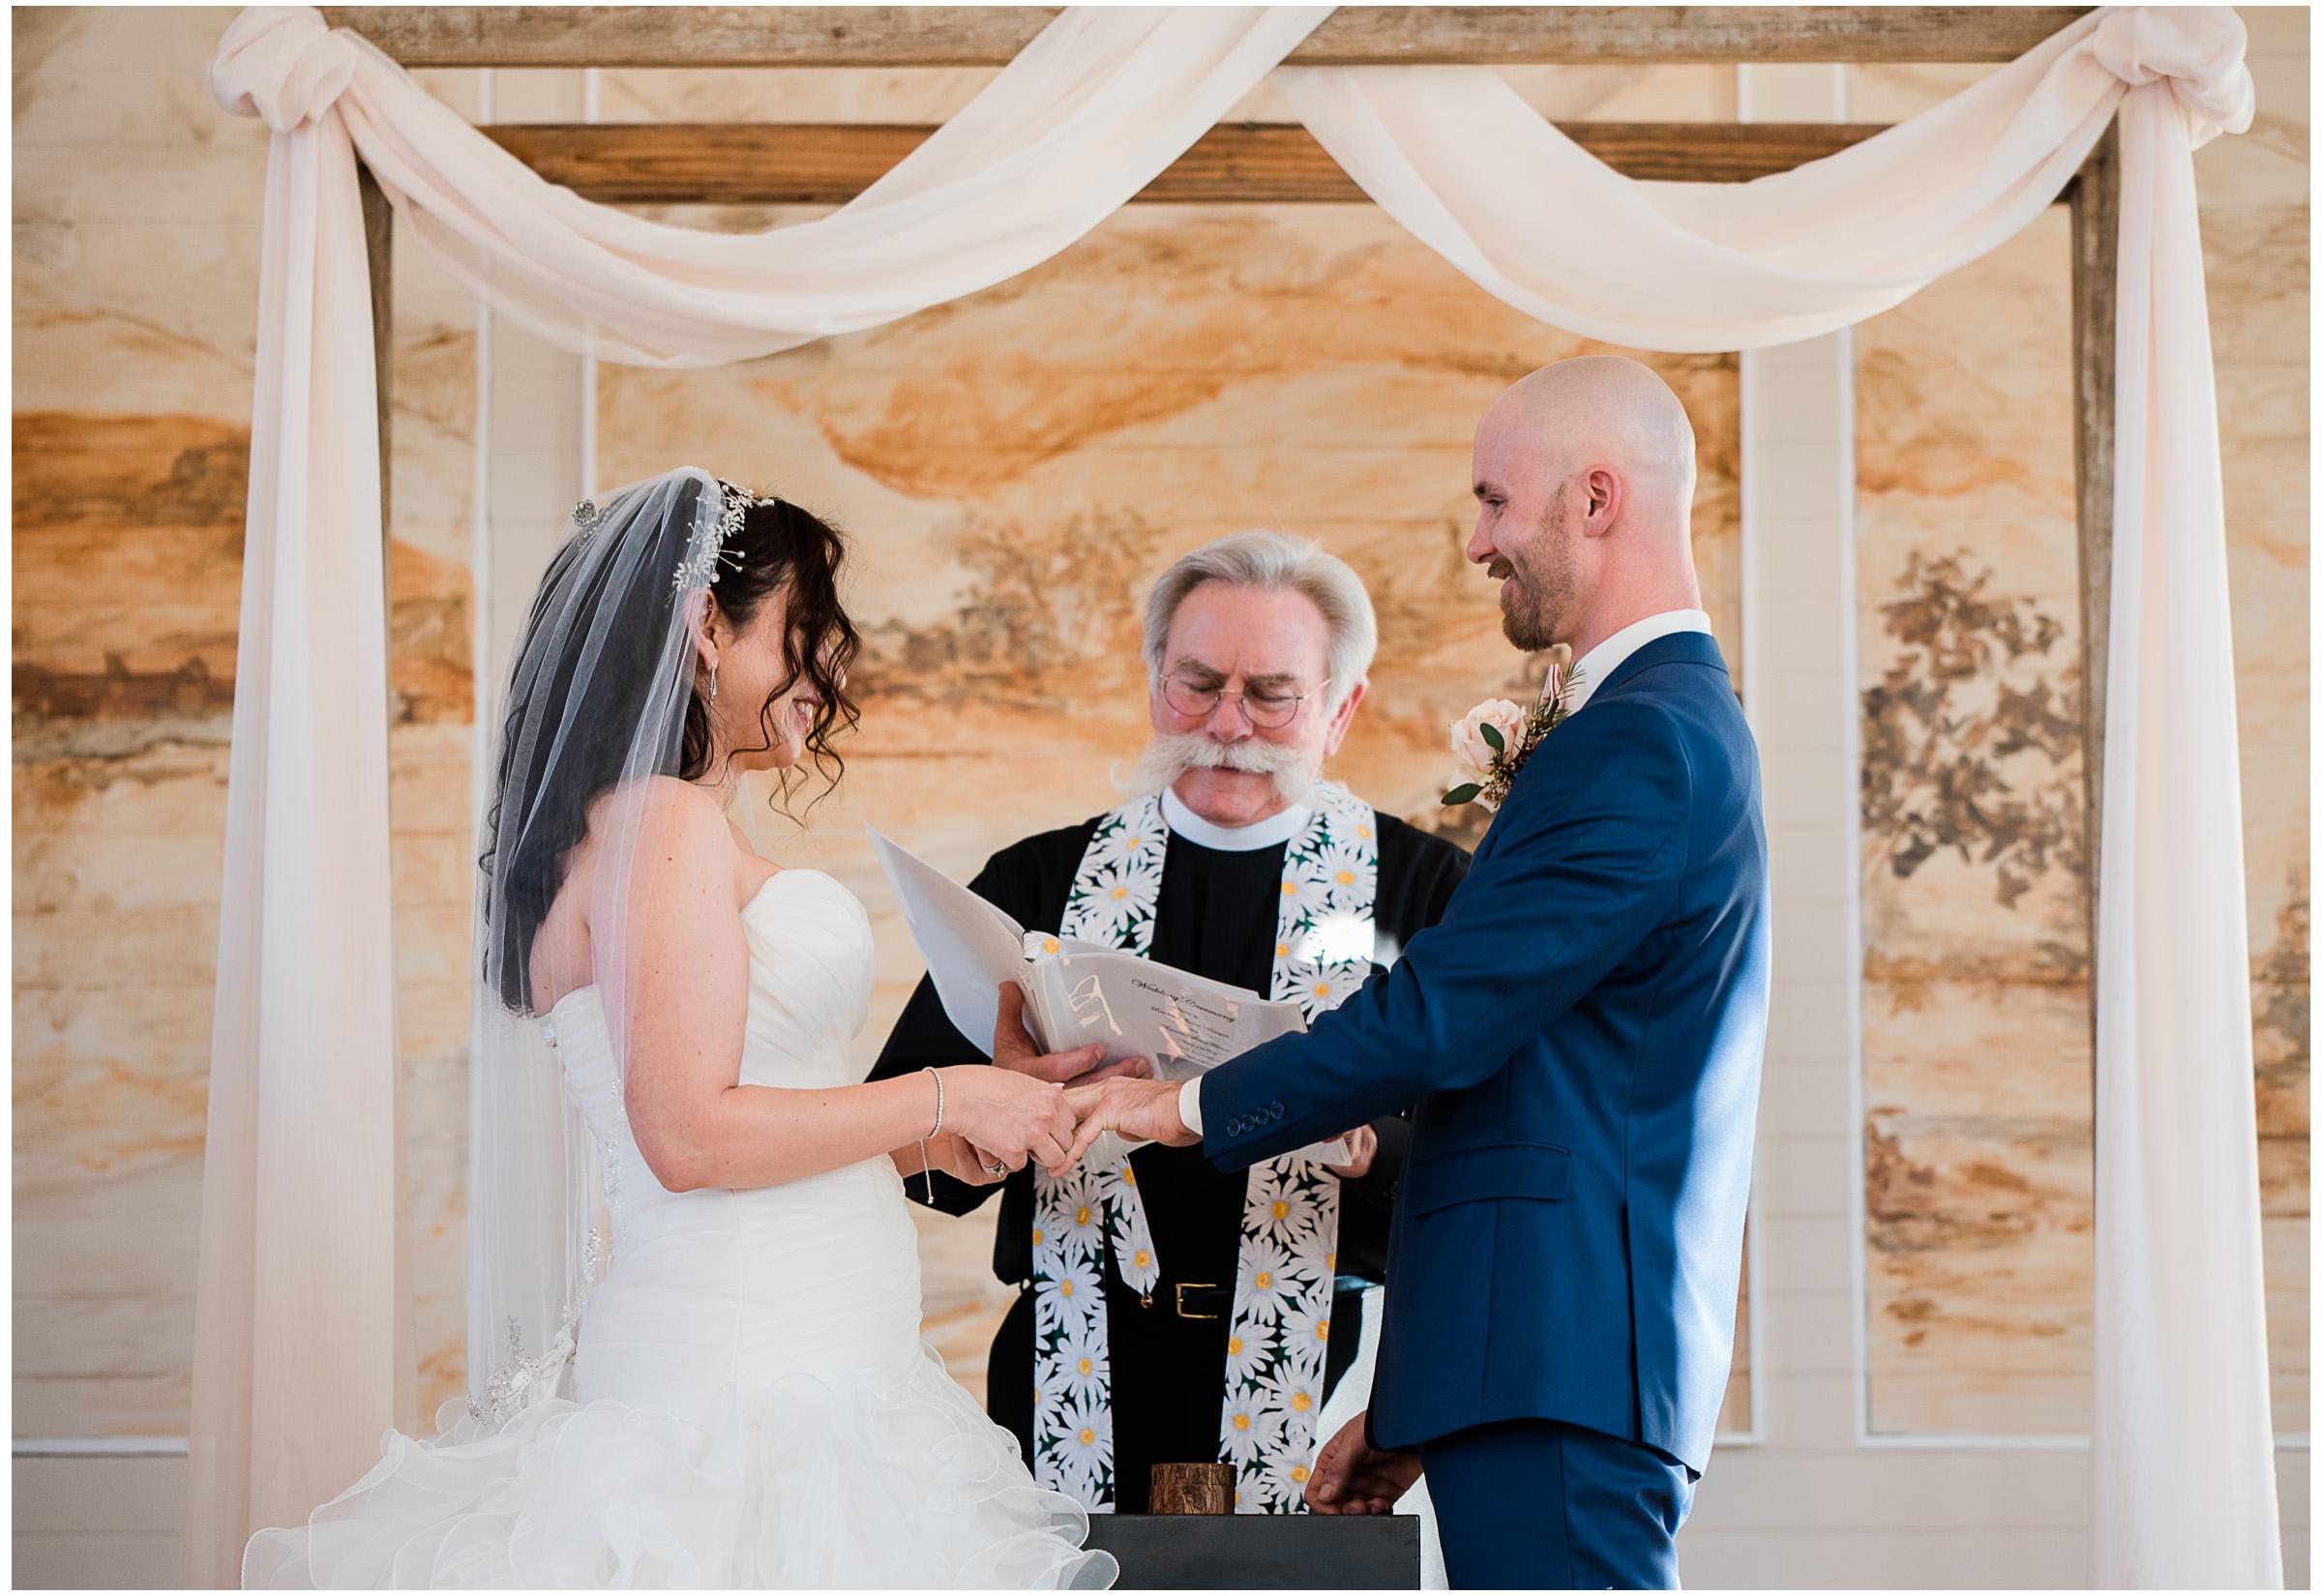 Sacramento Wedding - Sacramento Photographer - Justin Wilcox Photography - 14.jpg